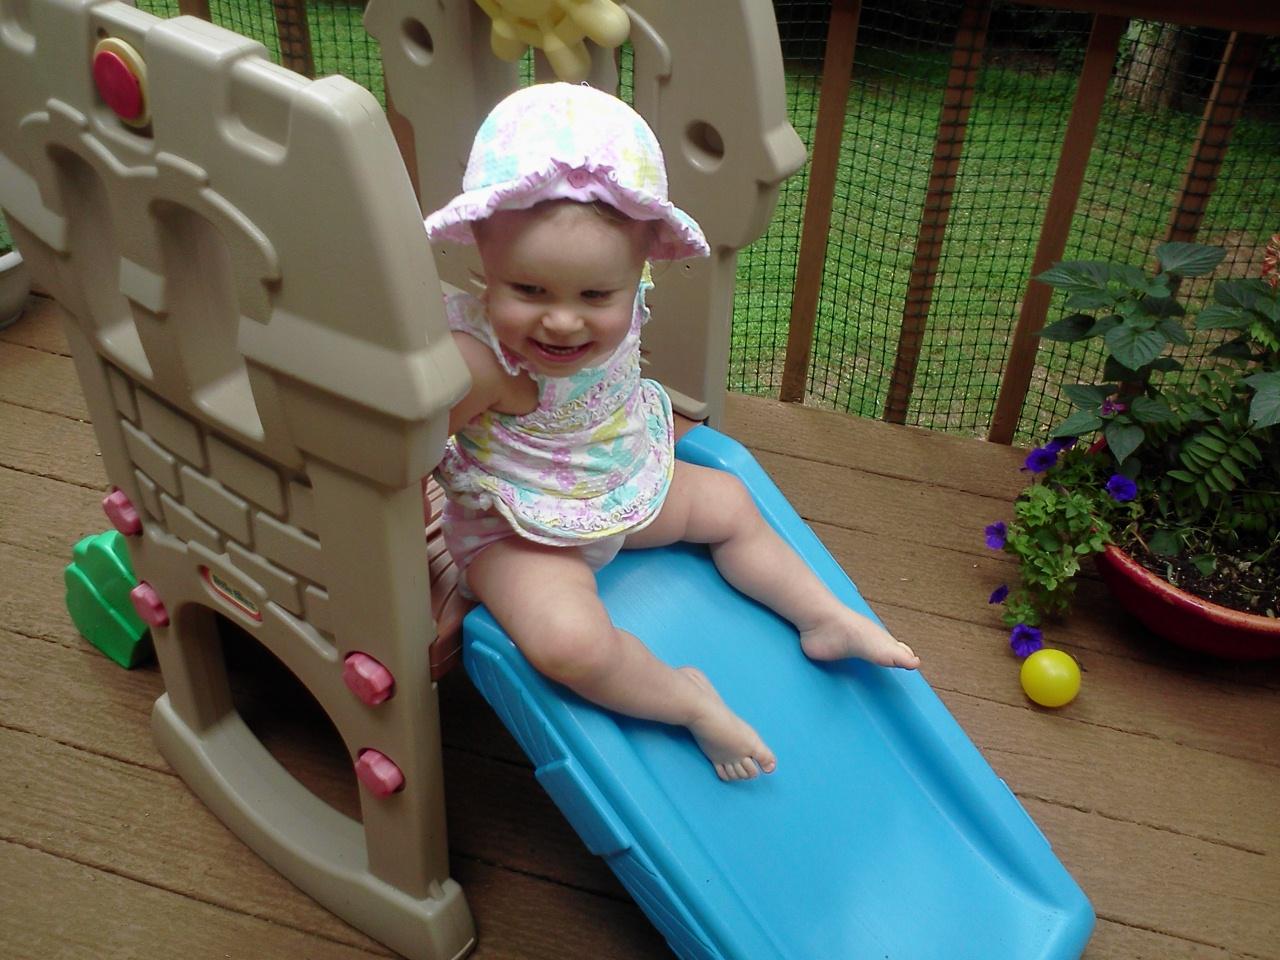 Baby on Slide